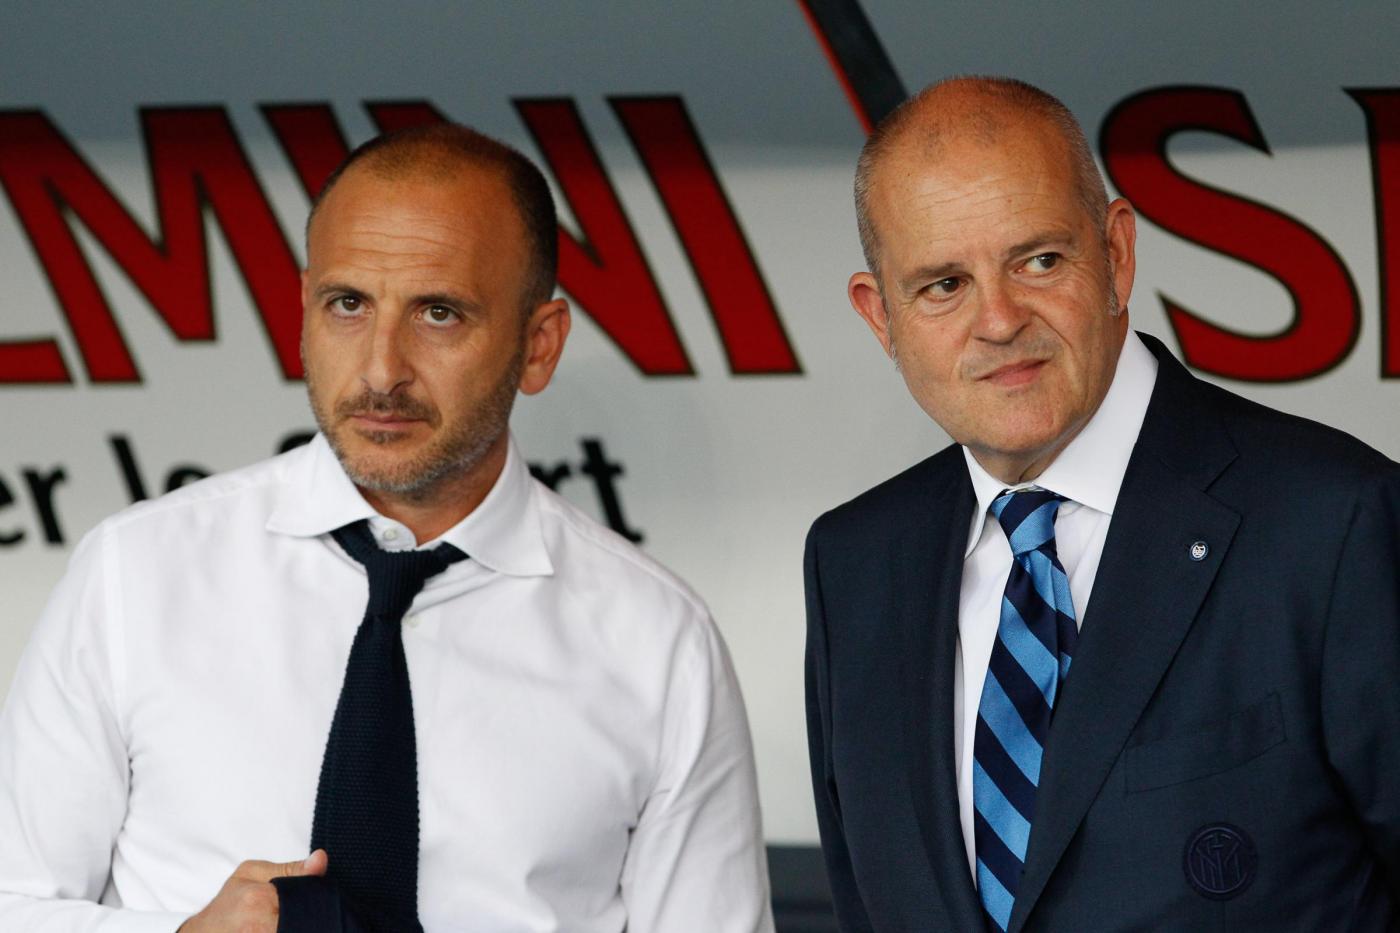 Calciomercato Inter, Ausilio: